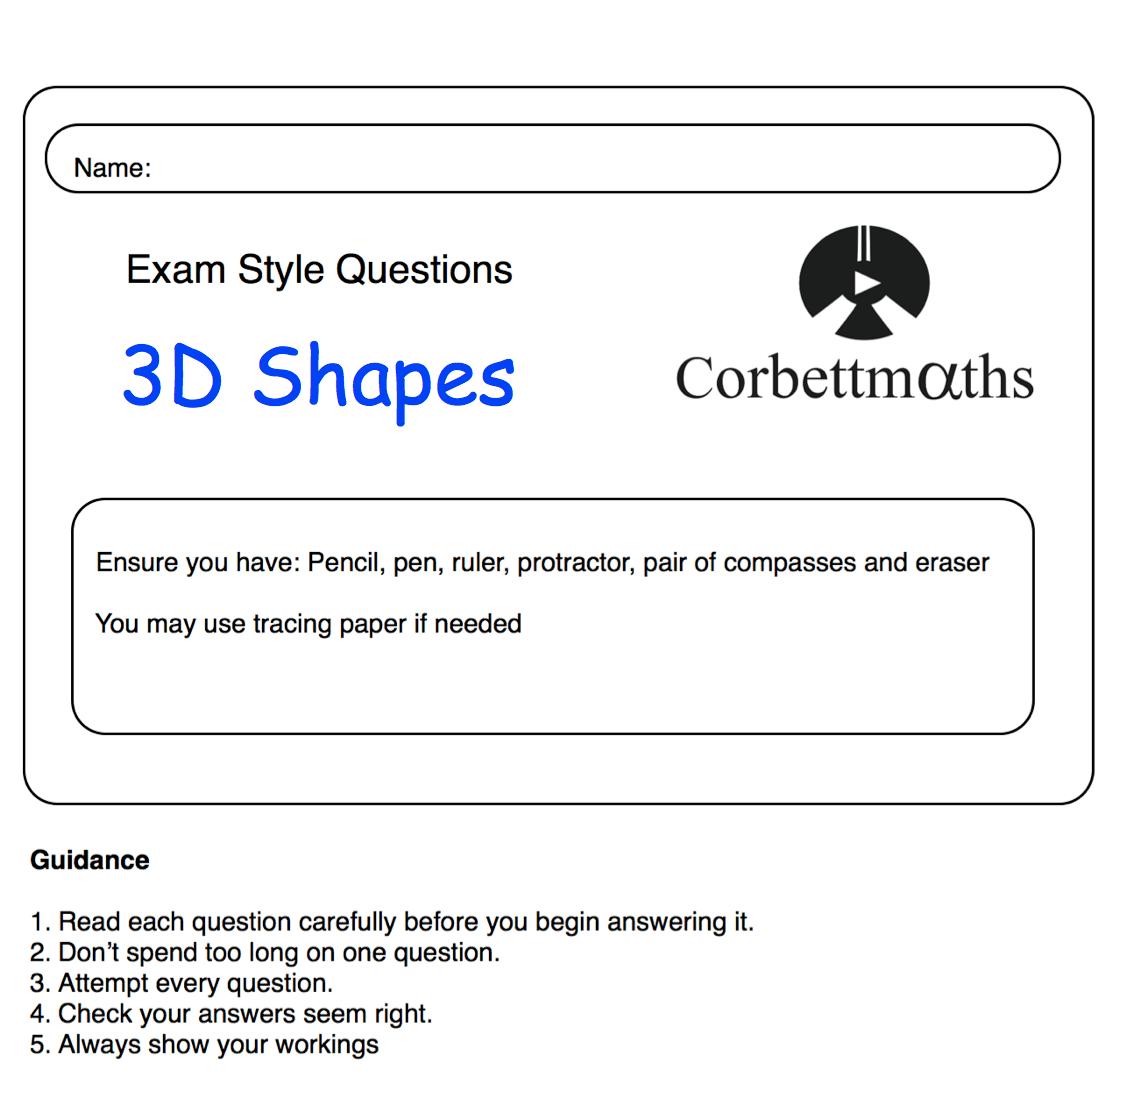 medium resolution of 3D Shapes Practice Questions – Corbettmaths